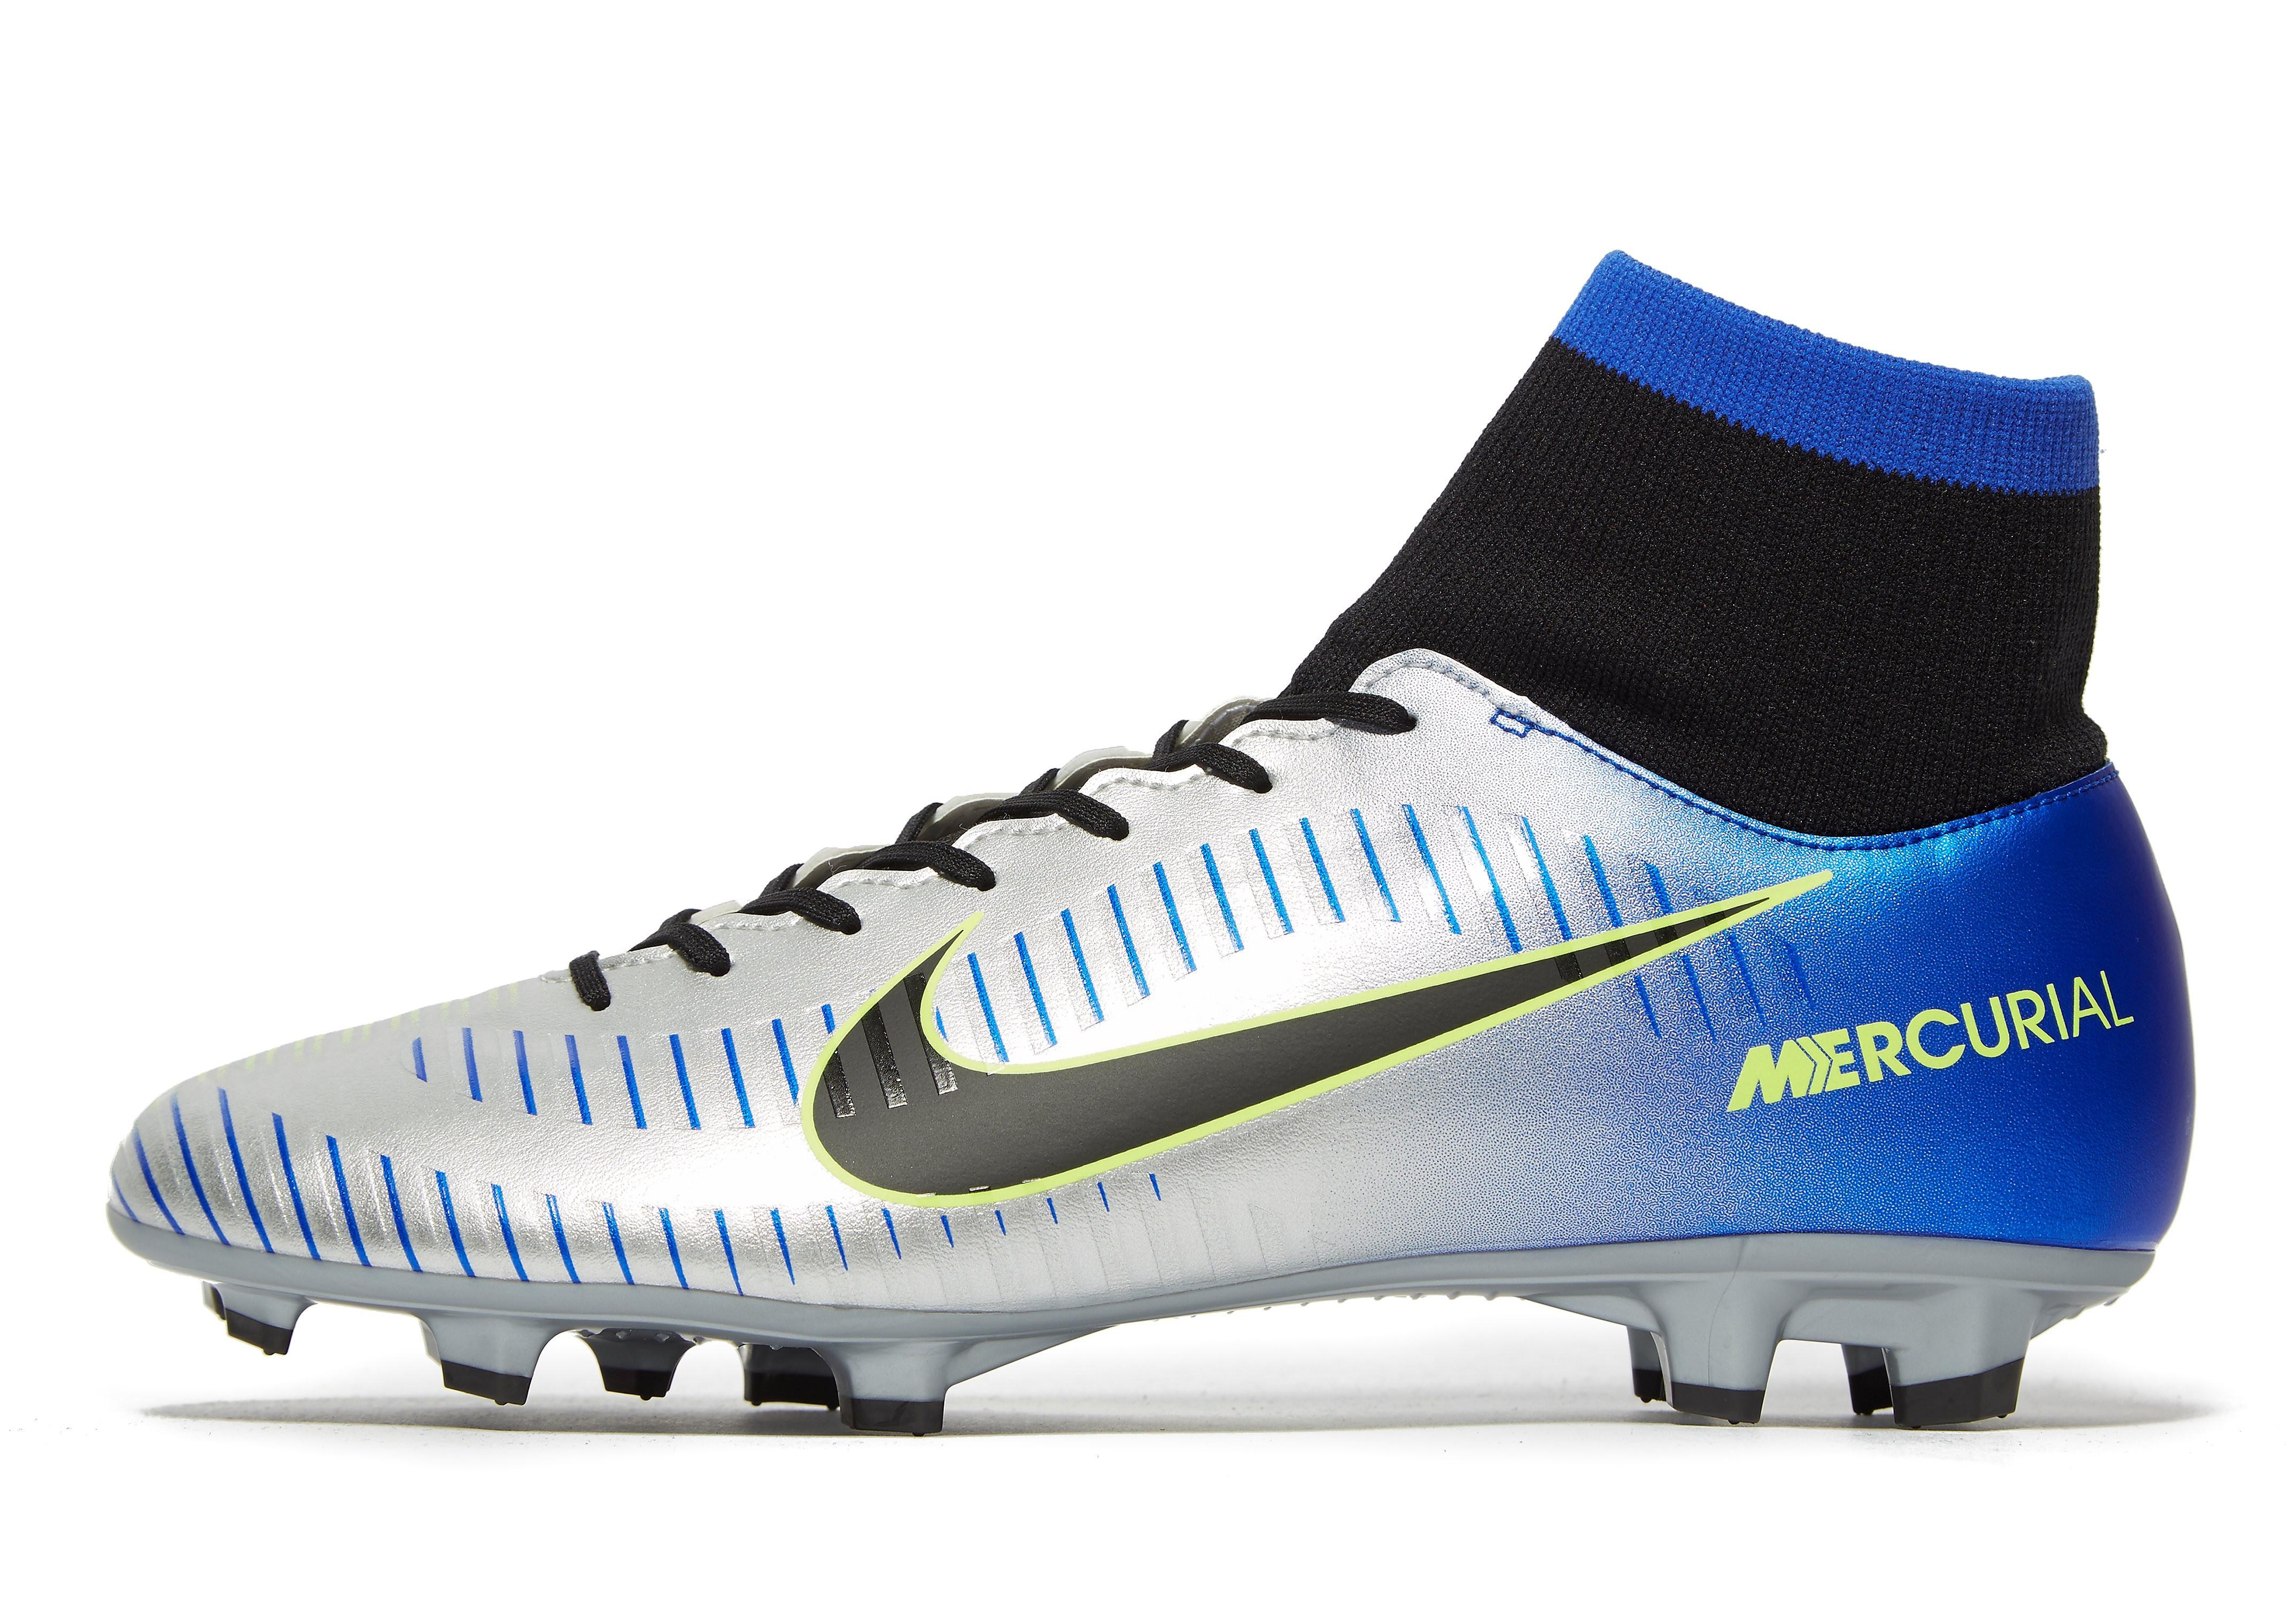 Nike Neymar Jr Mercurial Victory Dynamic Fit XI FG